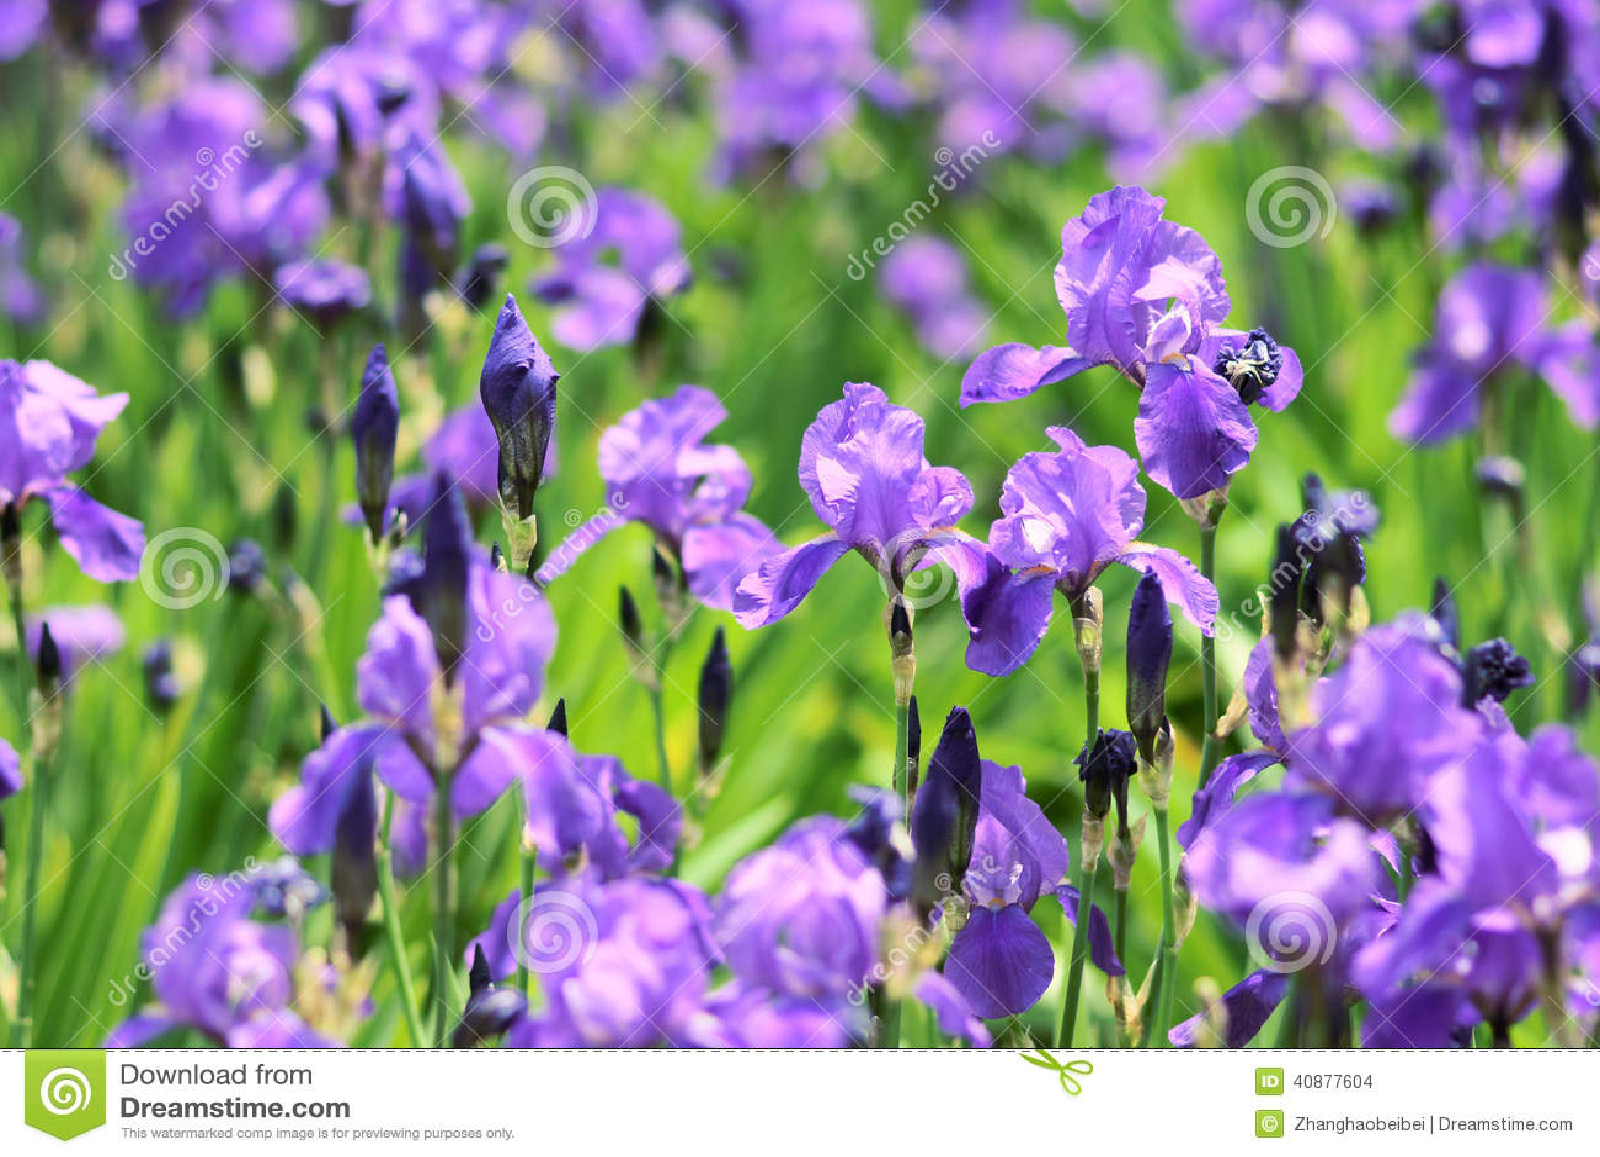 Iris Flowers Stock Photo Image Of Flower Garden Blossom 40877604